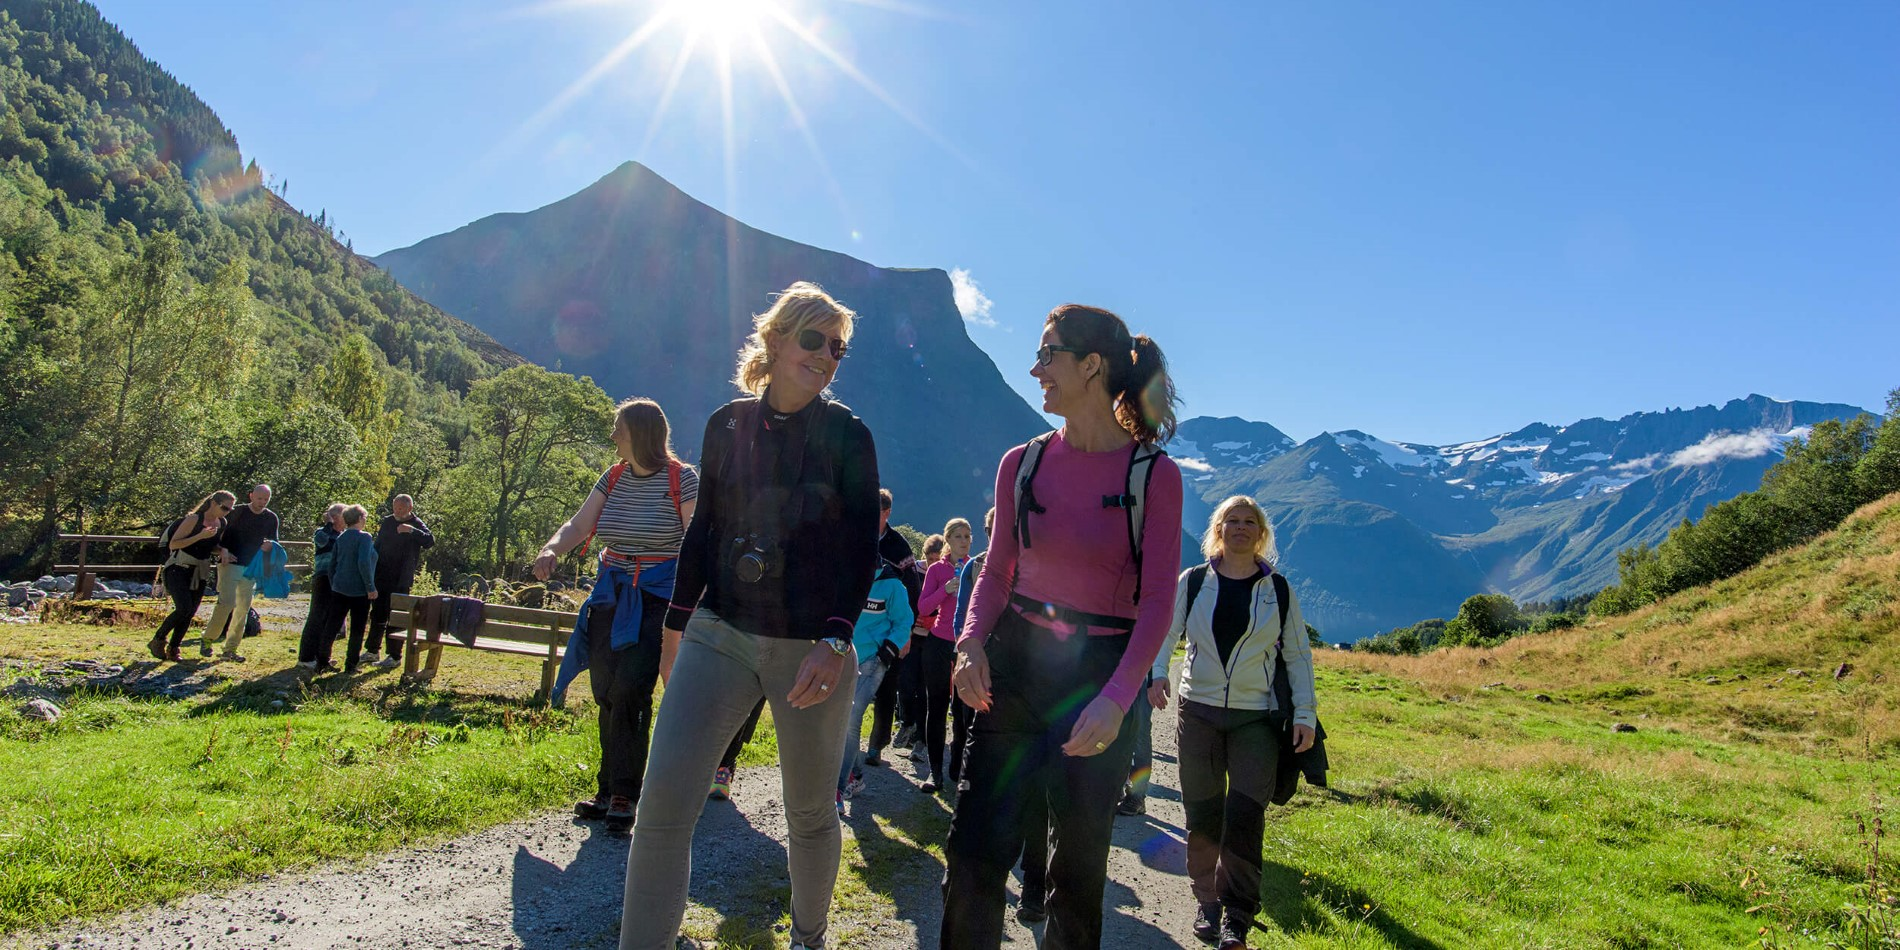 2h_hike_with_a_visit_to_a_shieling_51_hurtigruten_hjoerundfjorden_foto_ørjan_bertelsen_056.jpg